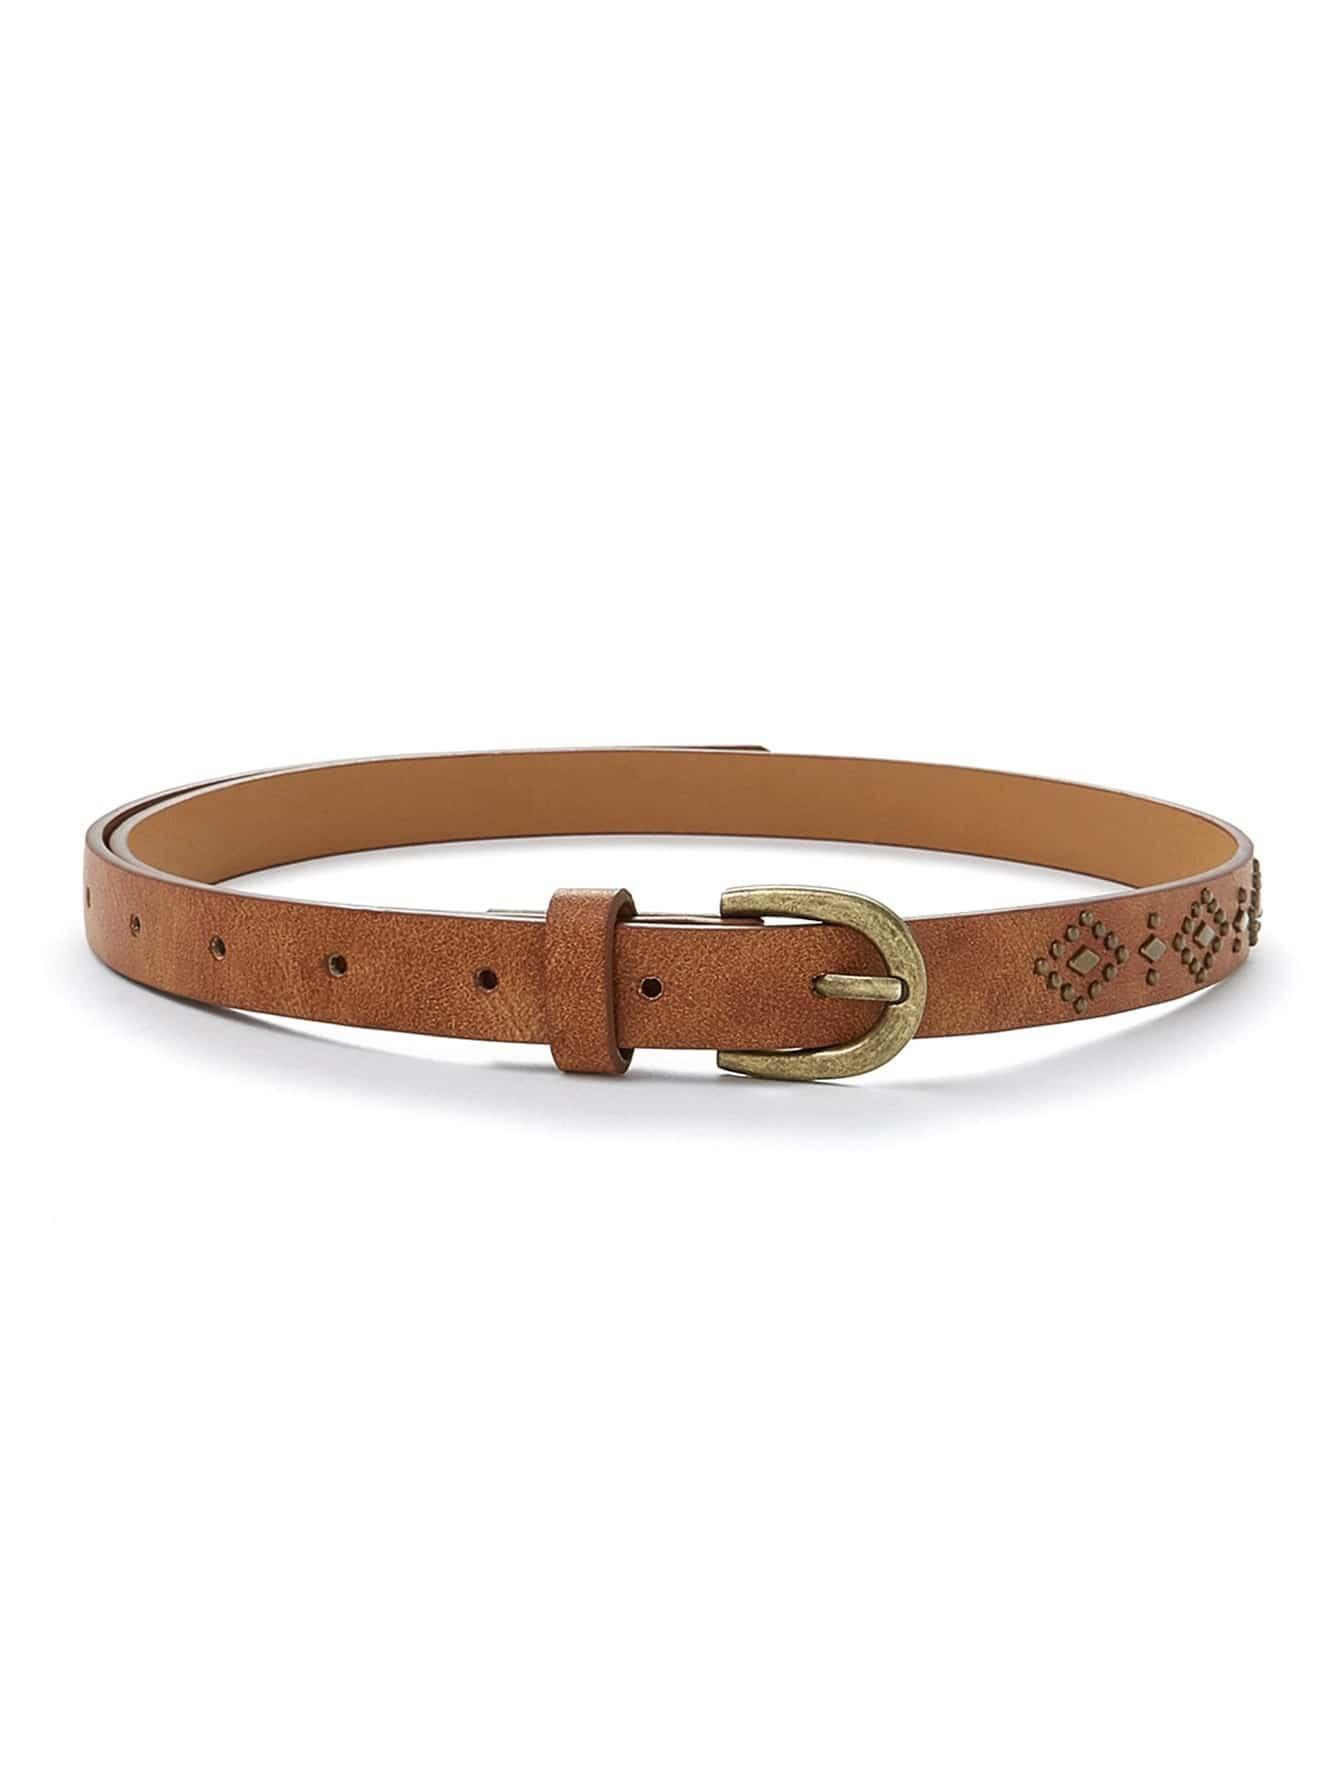 Studd Decorated Belt